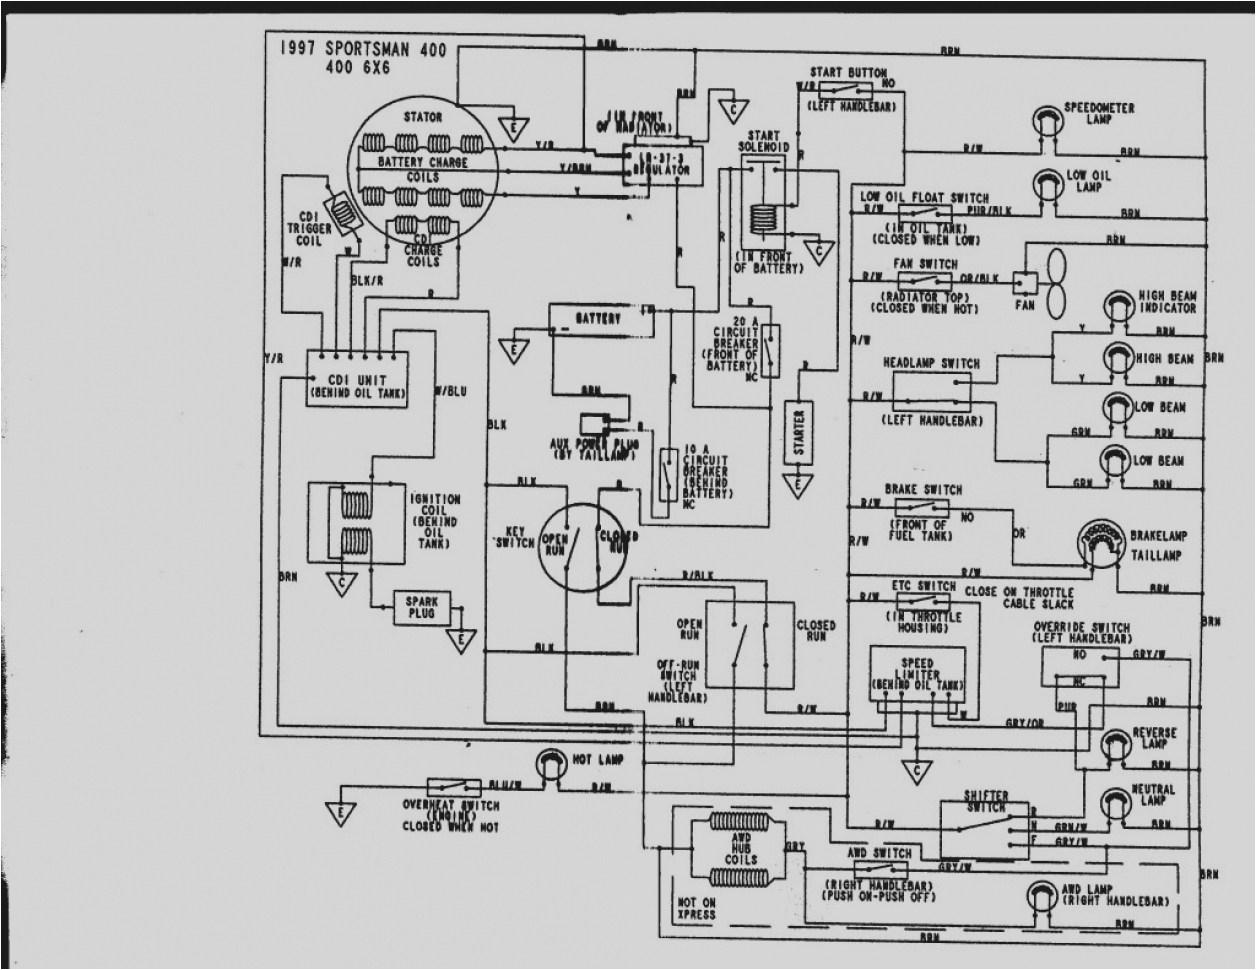 polaris electrical diagram wiring diagram operations polaris scrambler wiring schematic polaris electrical schematics wiring diagram sheet